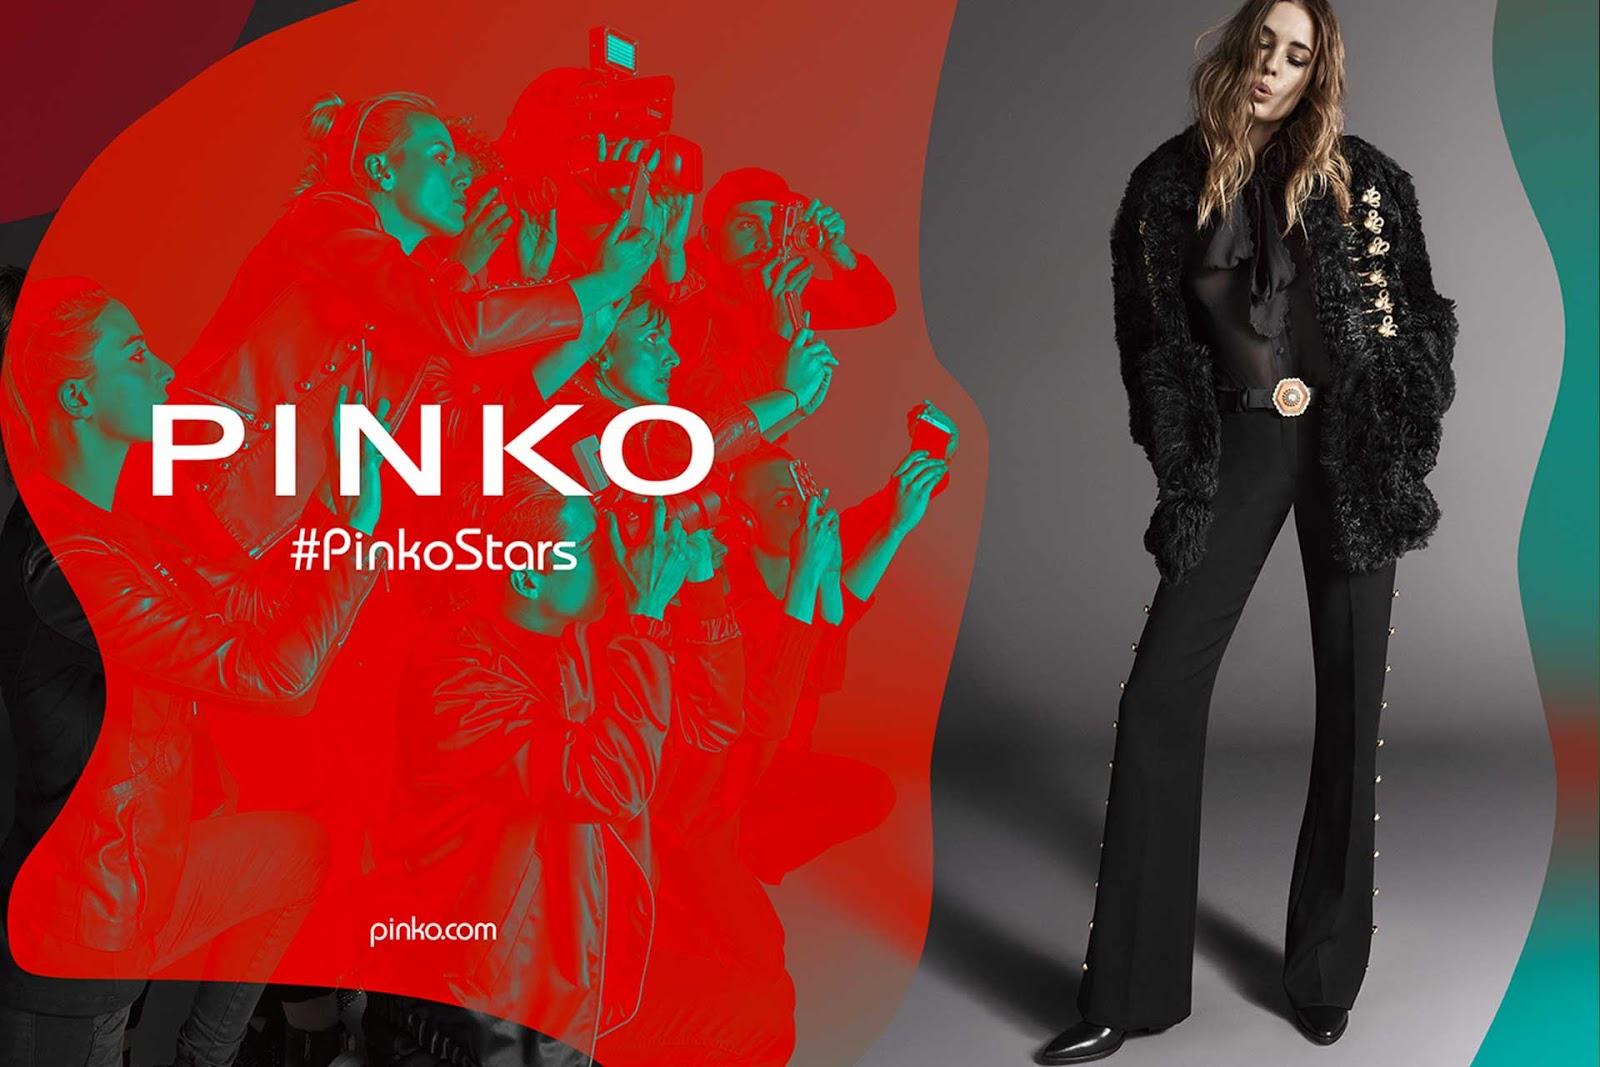 Pinko ADV FW 2016/2017 | Marco Pietracupa | Pinko | Sissy Vian | Numerique Retouch Photo Retouching Studio